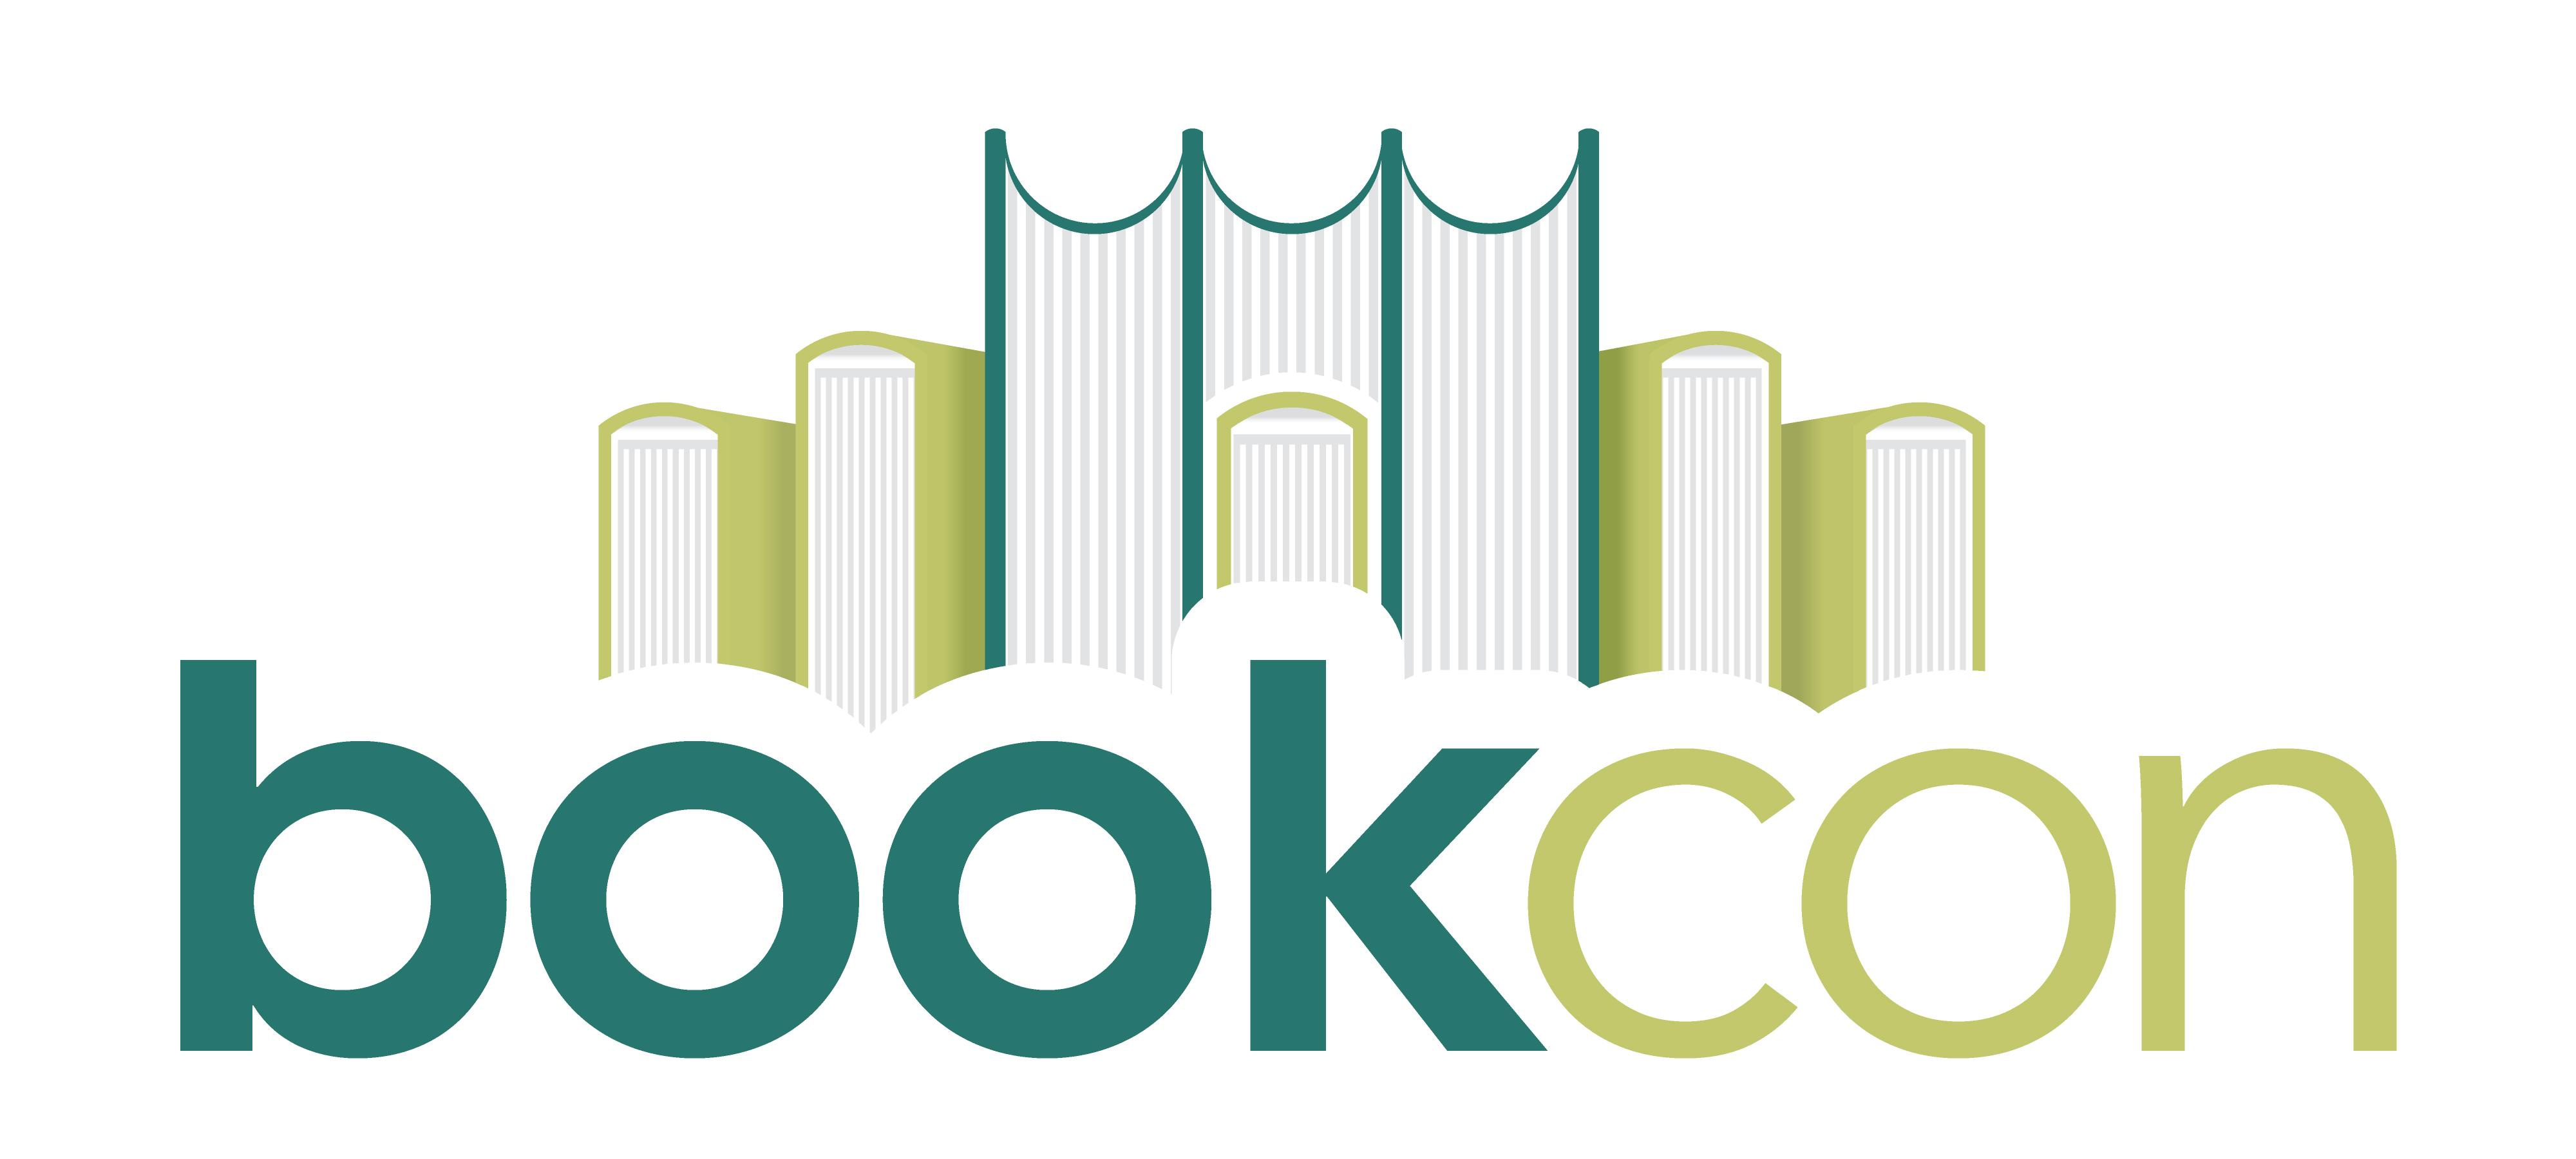 BookCon-Logo-No-Dates-JPG